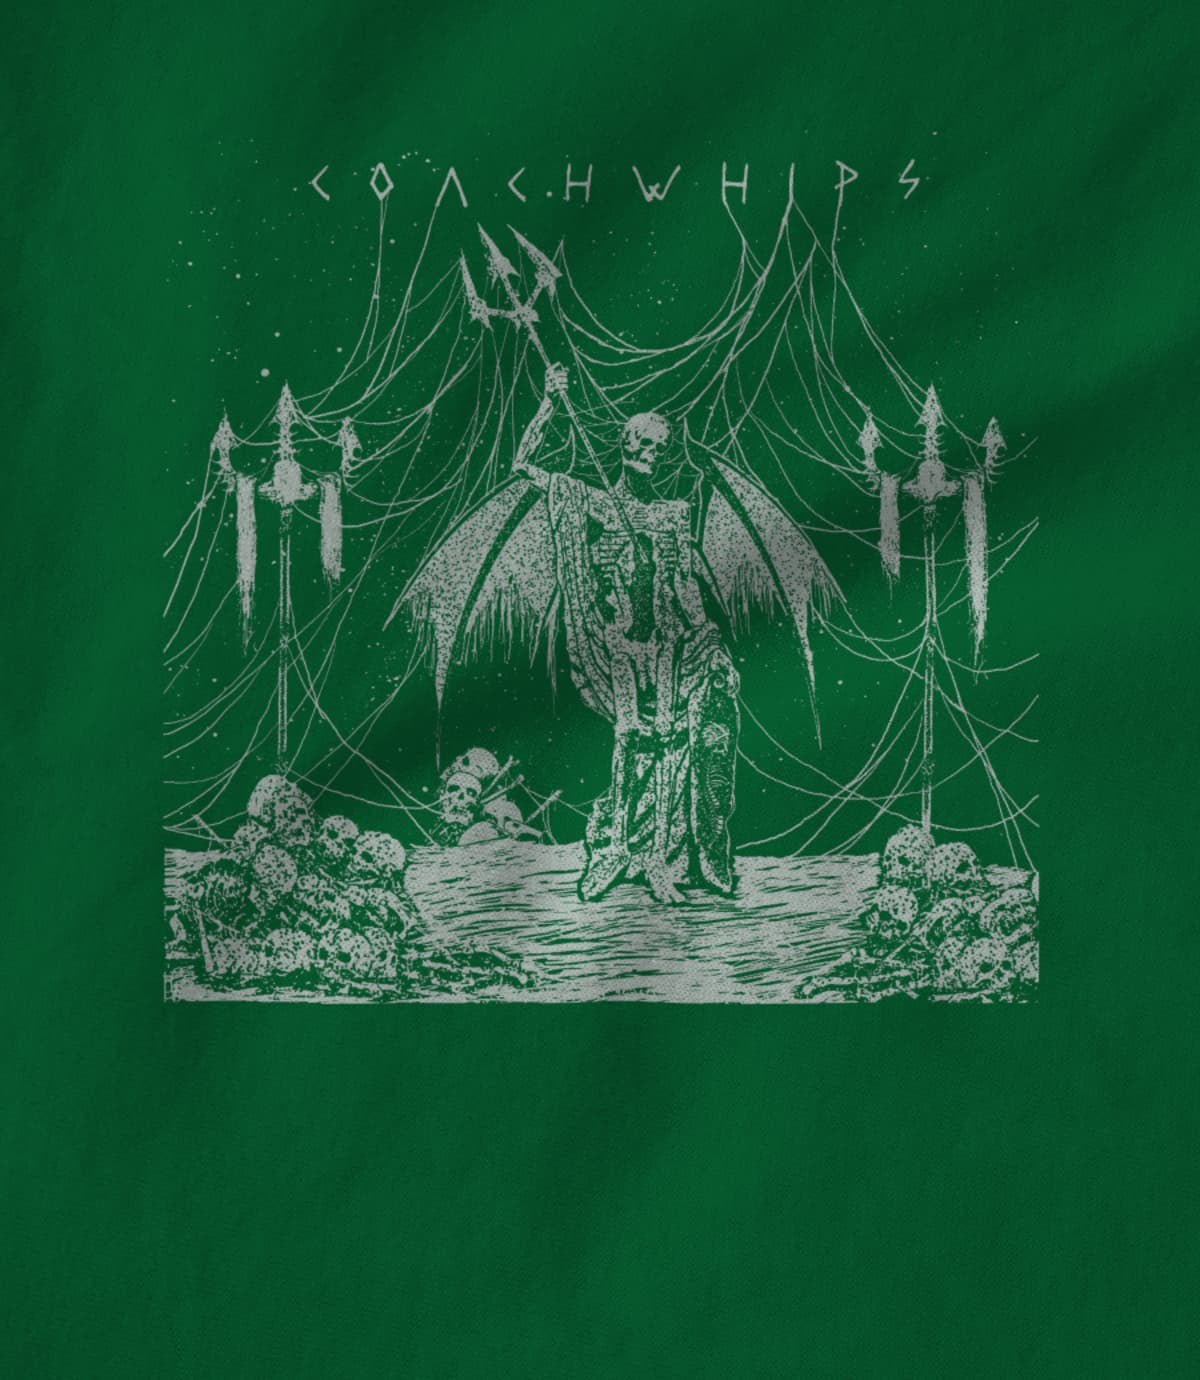 Girlsville coachwhips night train t shirt  green  1568079501